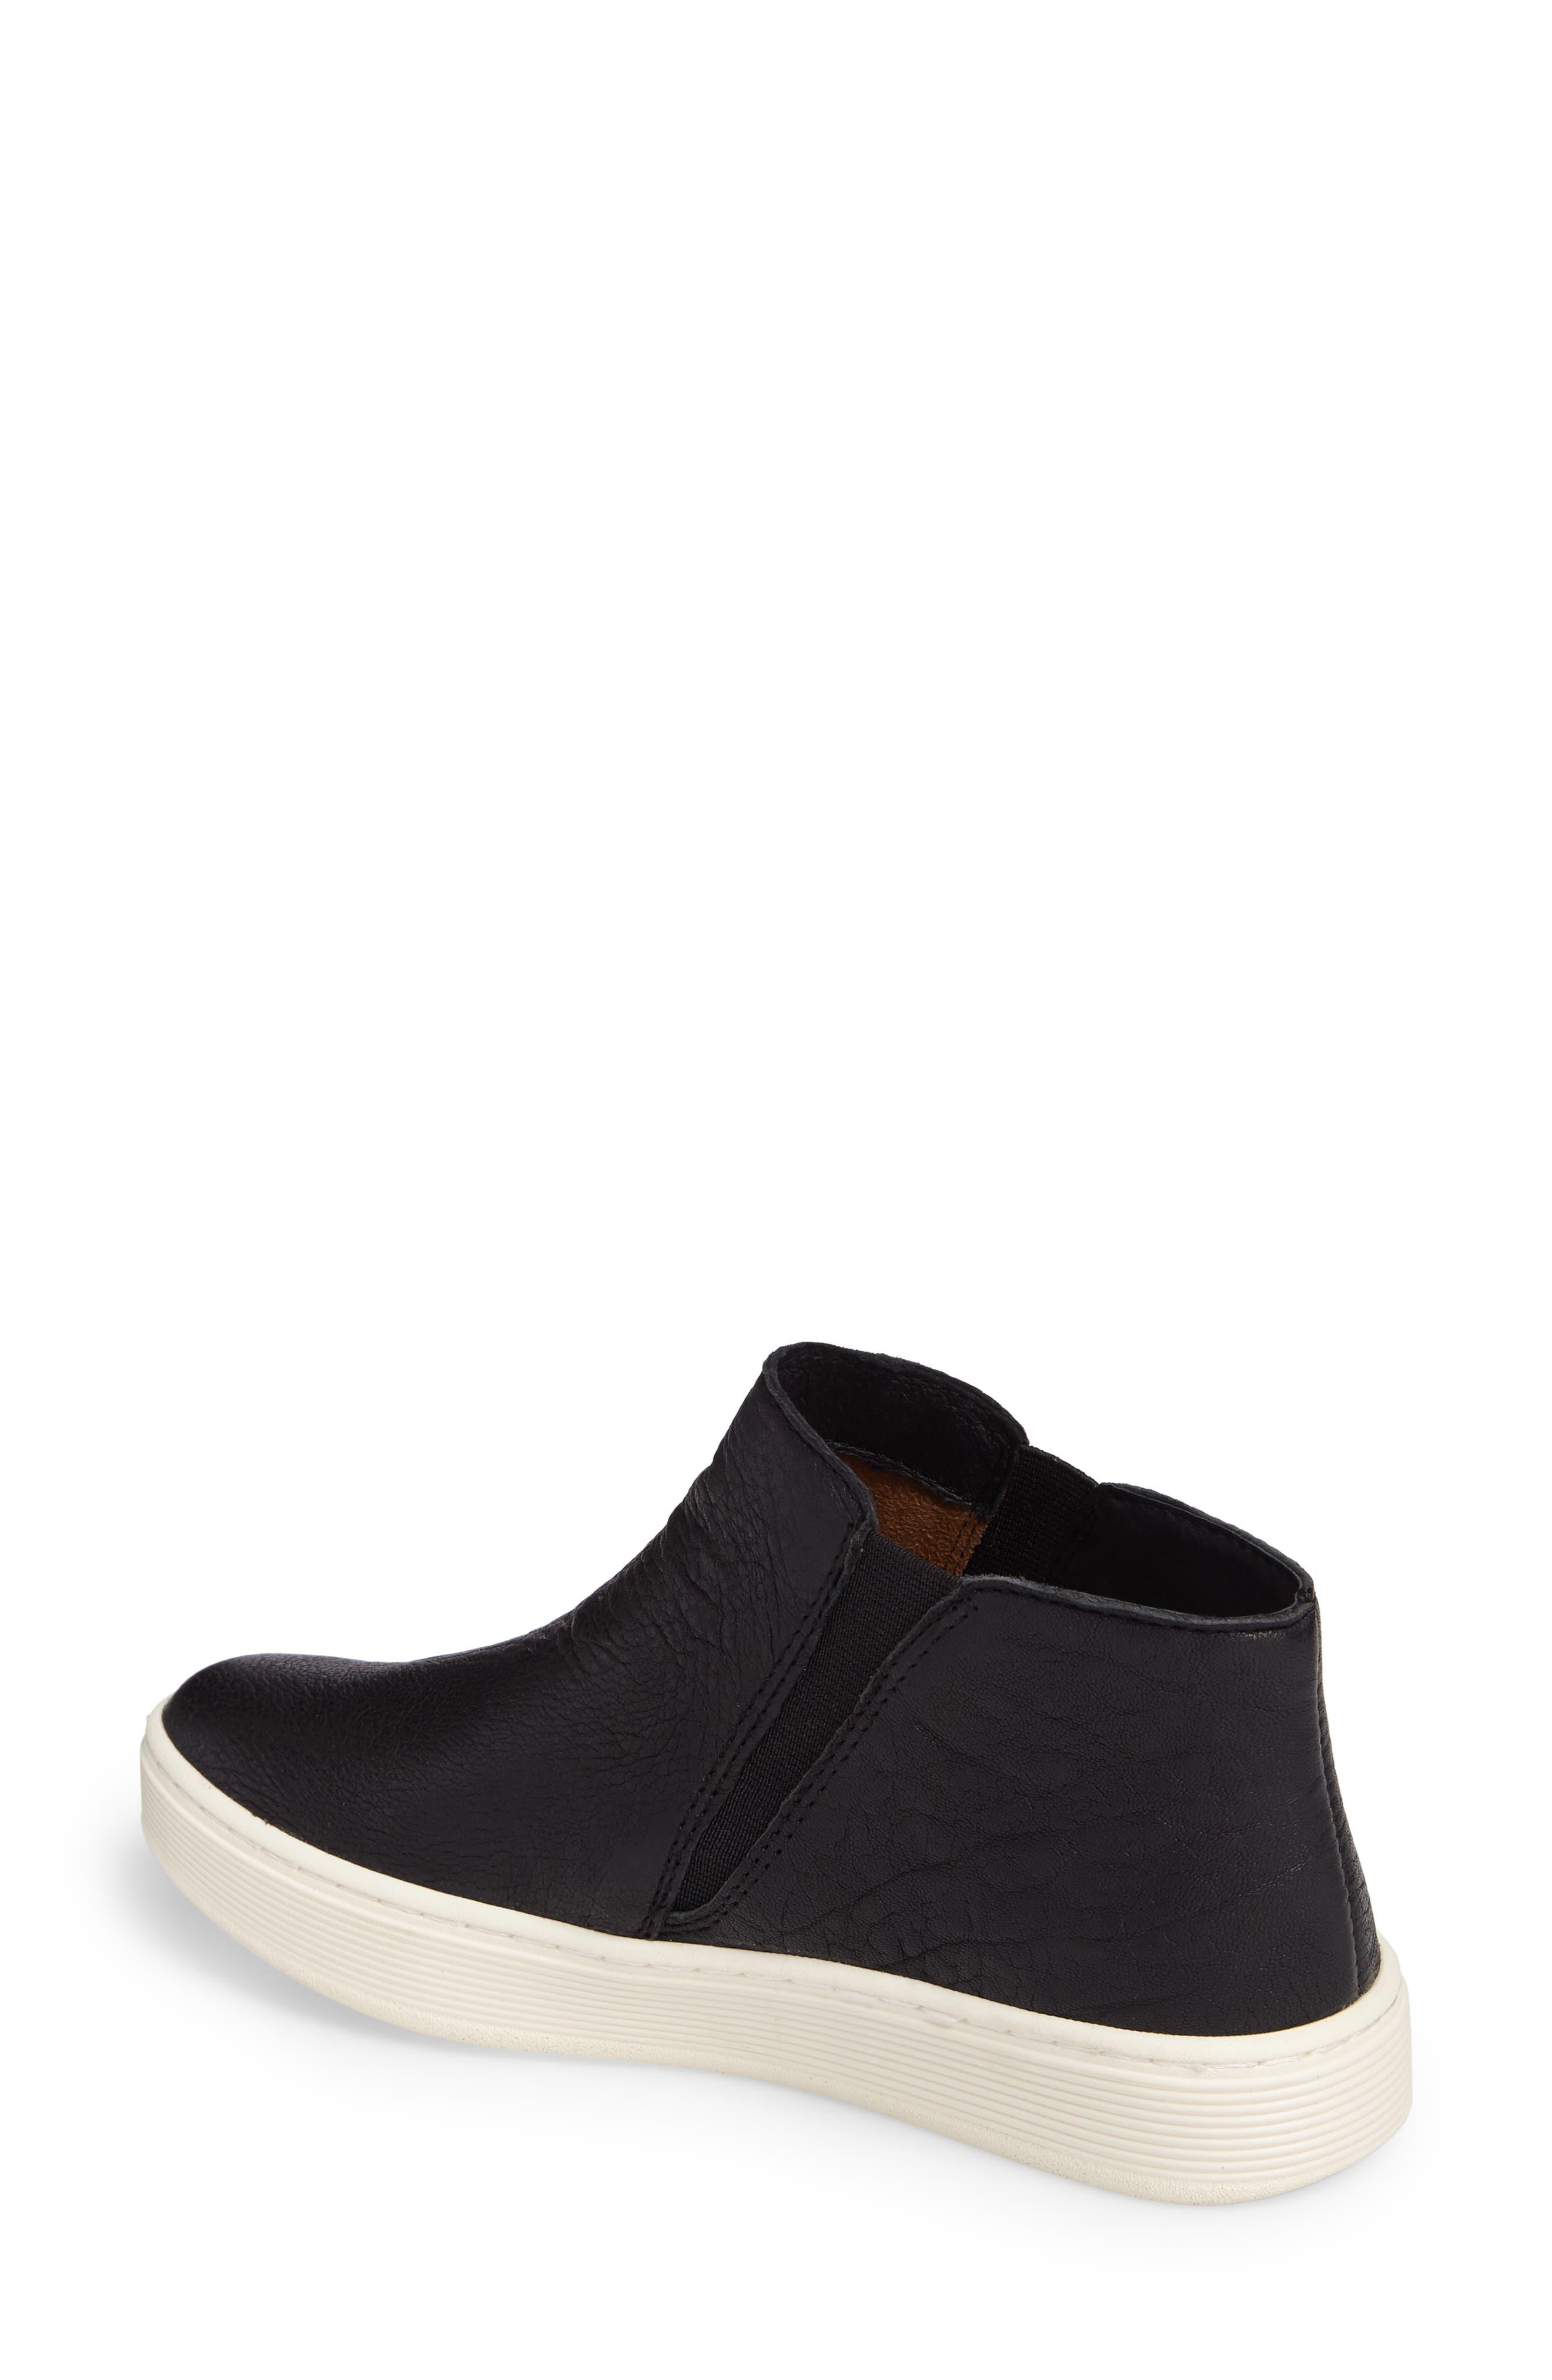 Britton Chelsea Sneaker,                             Alternate thumbnail 2, color,                             BLACK LEATHER